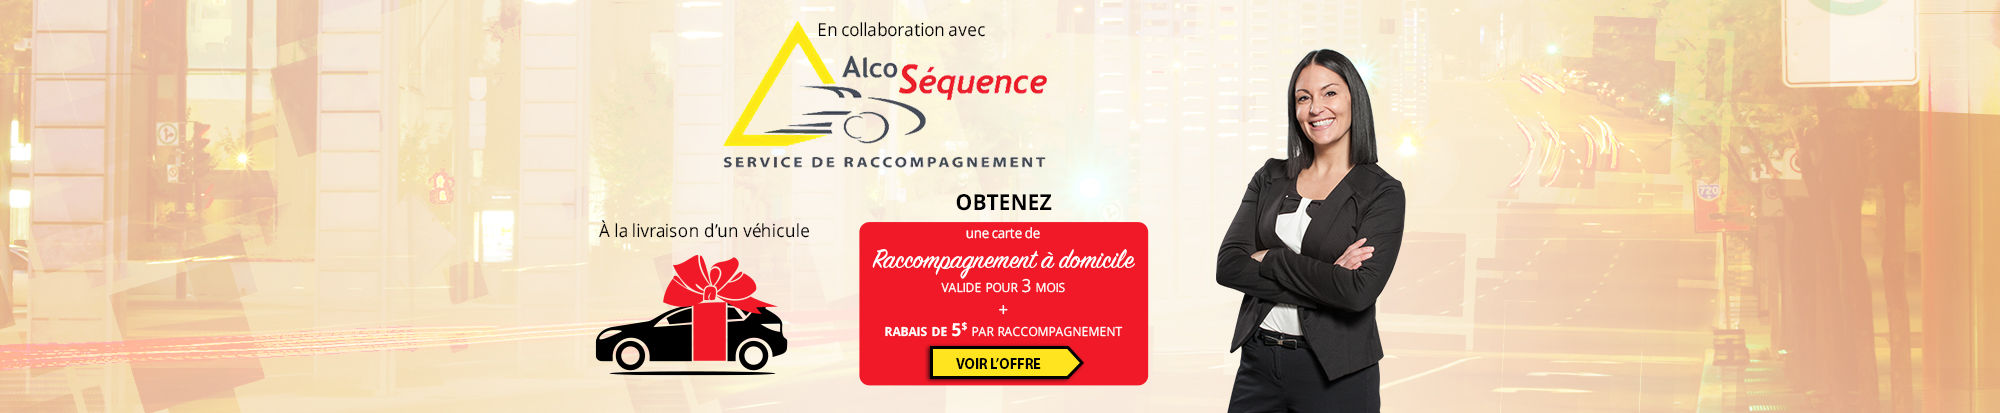 AlcoSéquence